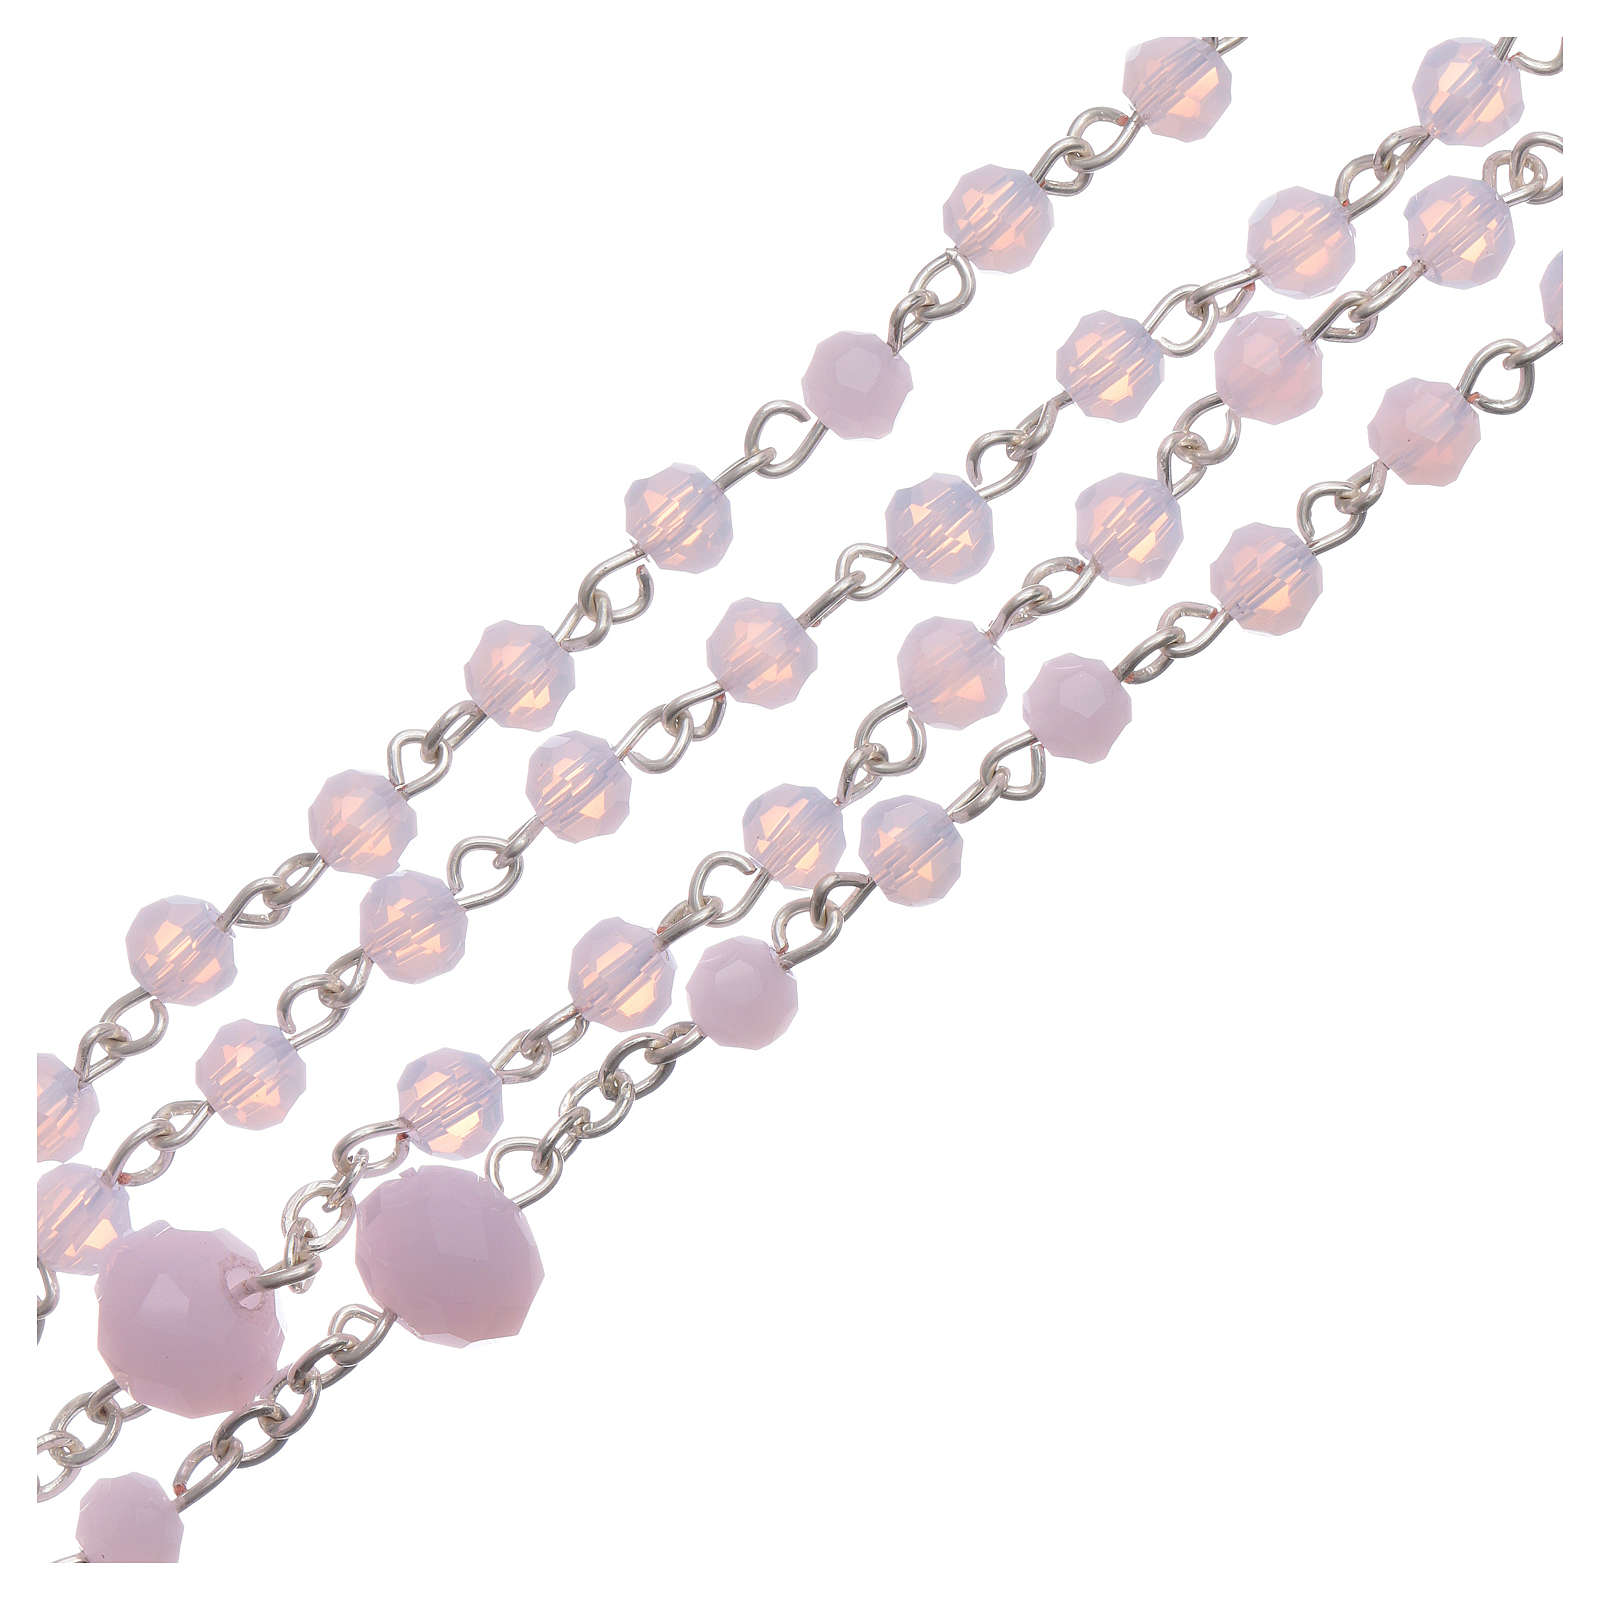 Medjugorje rosary necklace in pink crystal 4 mm 4